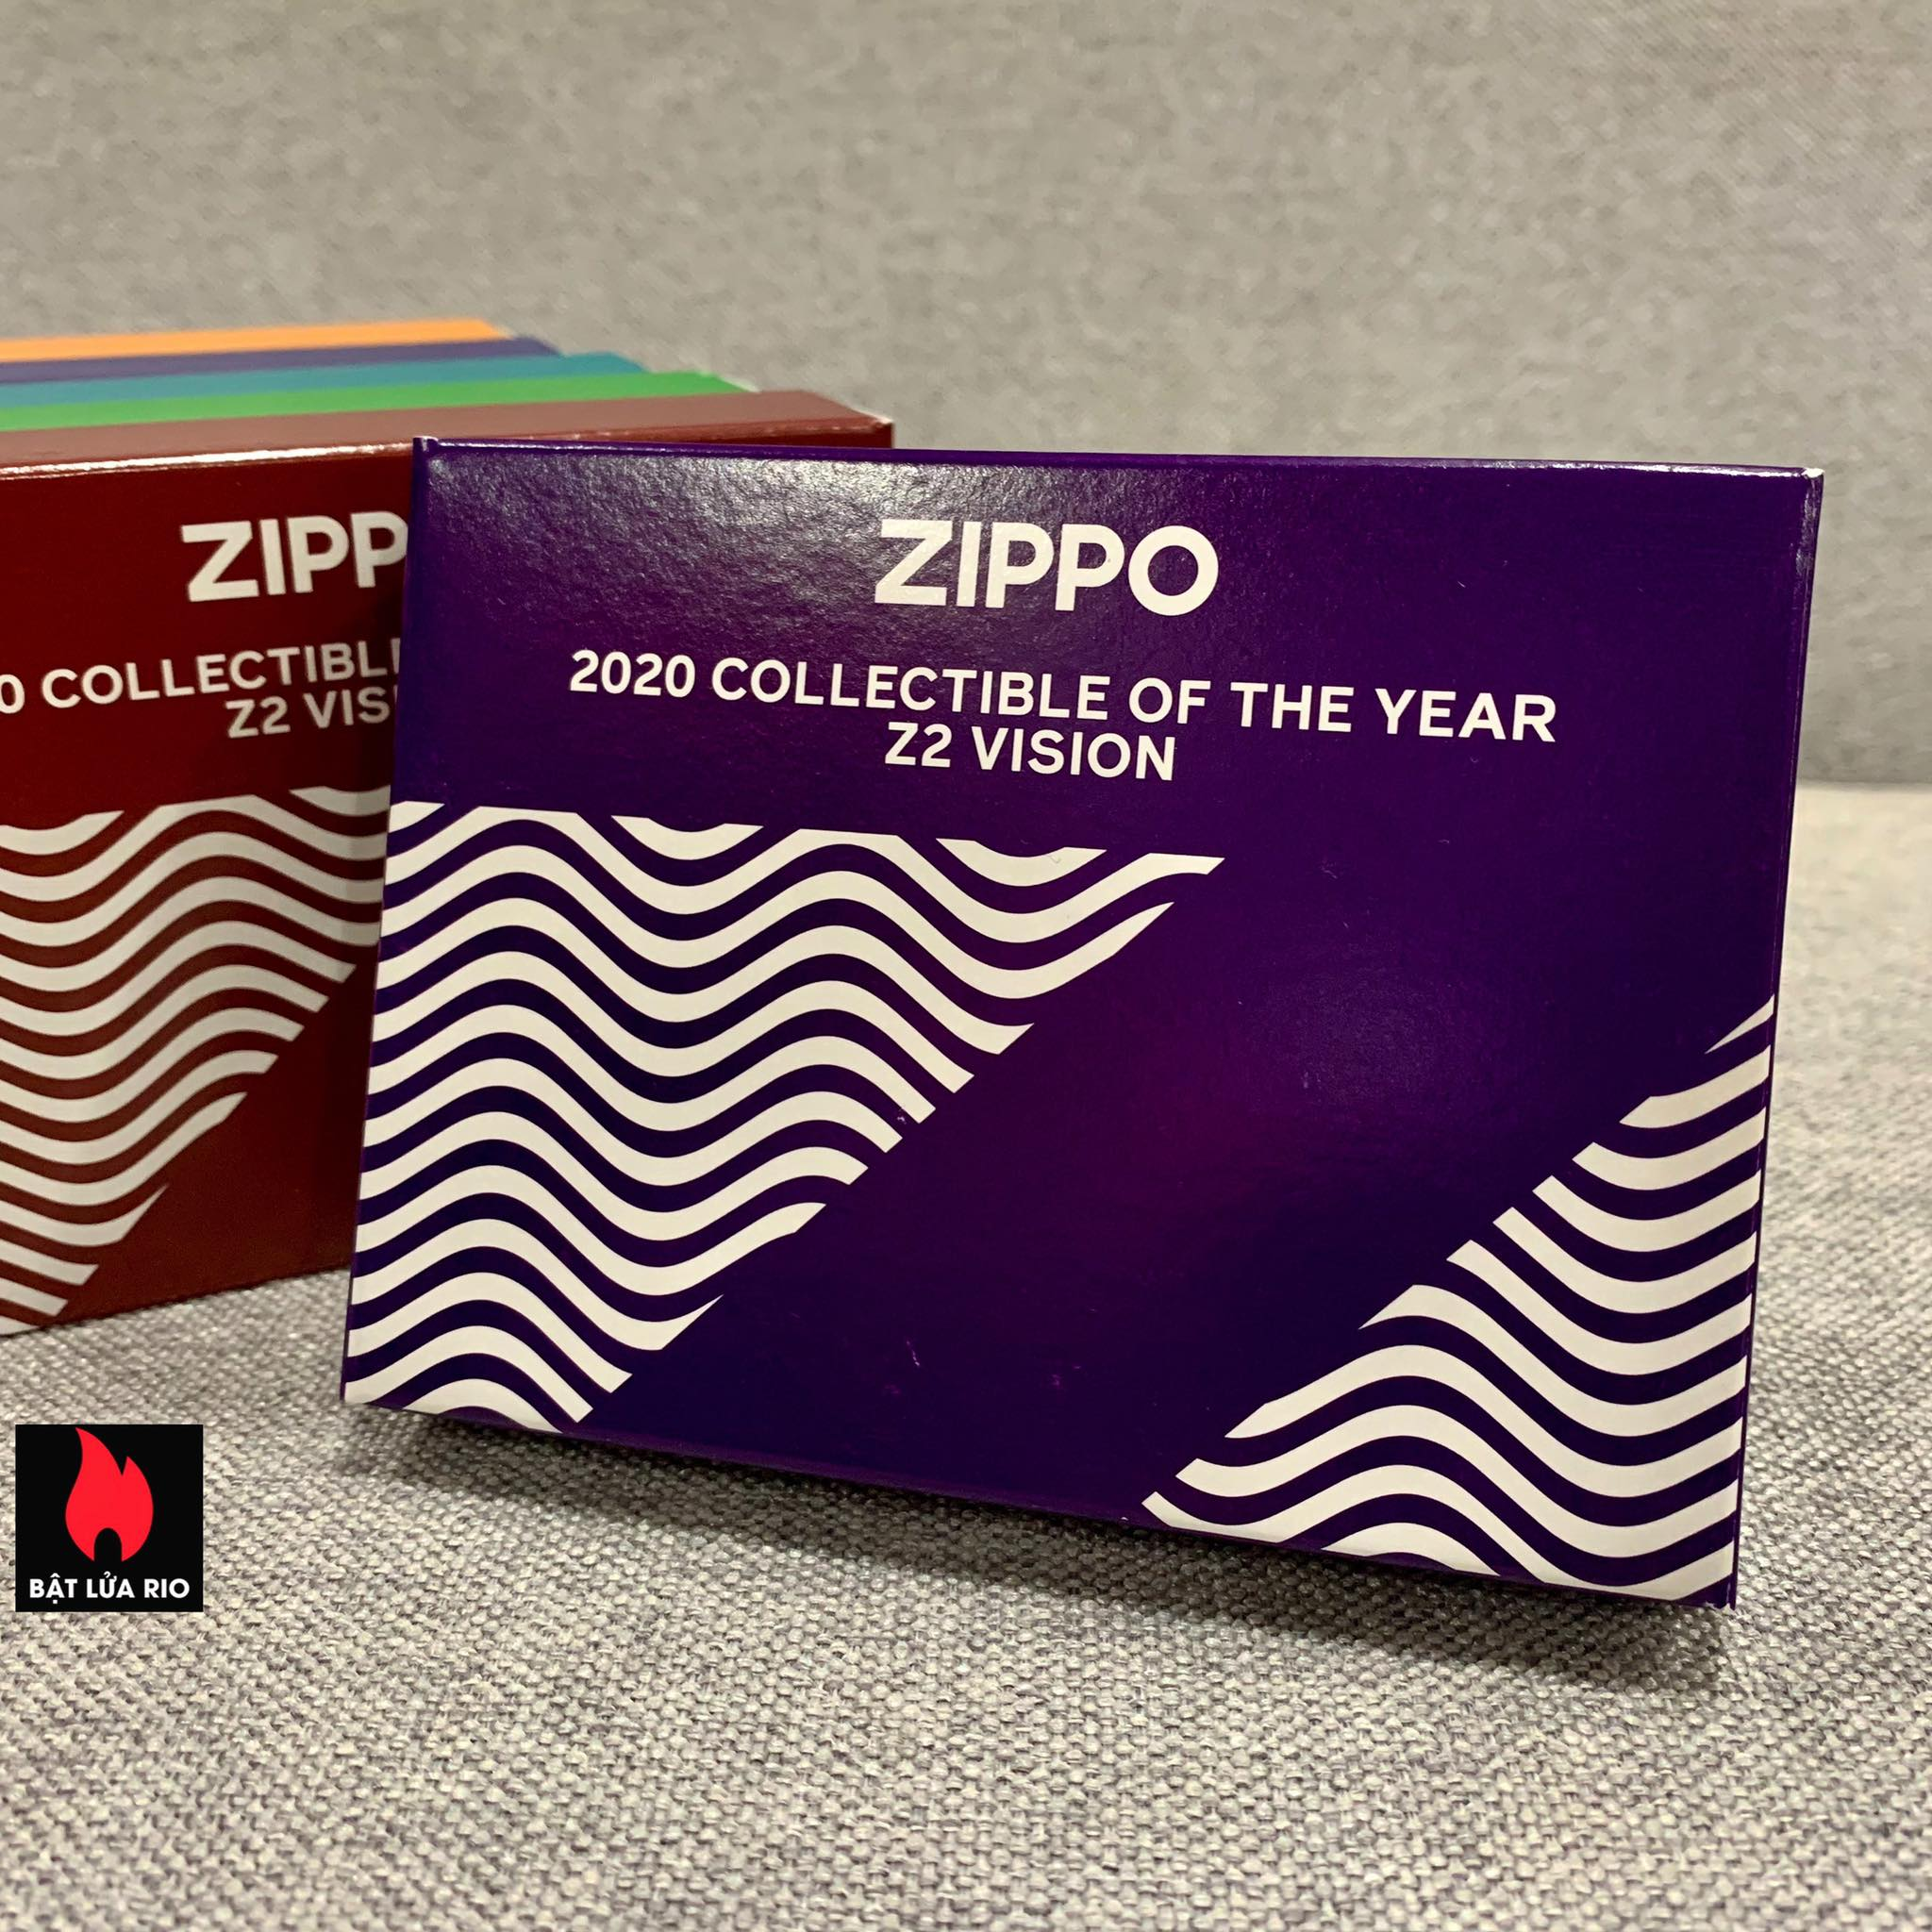 Zippo 49194 - Zippo 2020 Collectible Of The Year - Zippo Coty 2020 - Zippo Z2 Vision 47